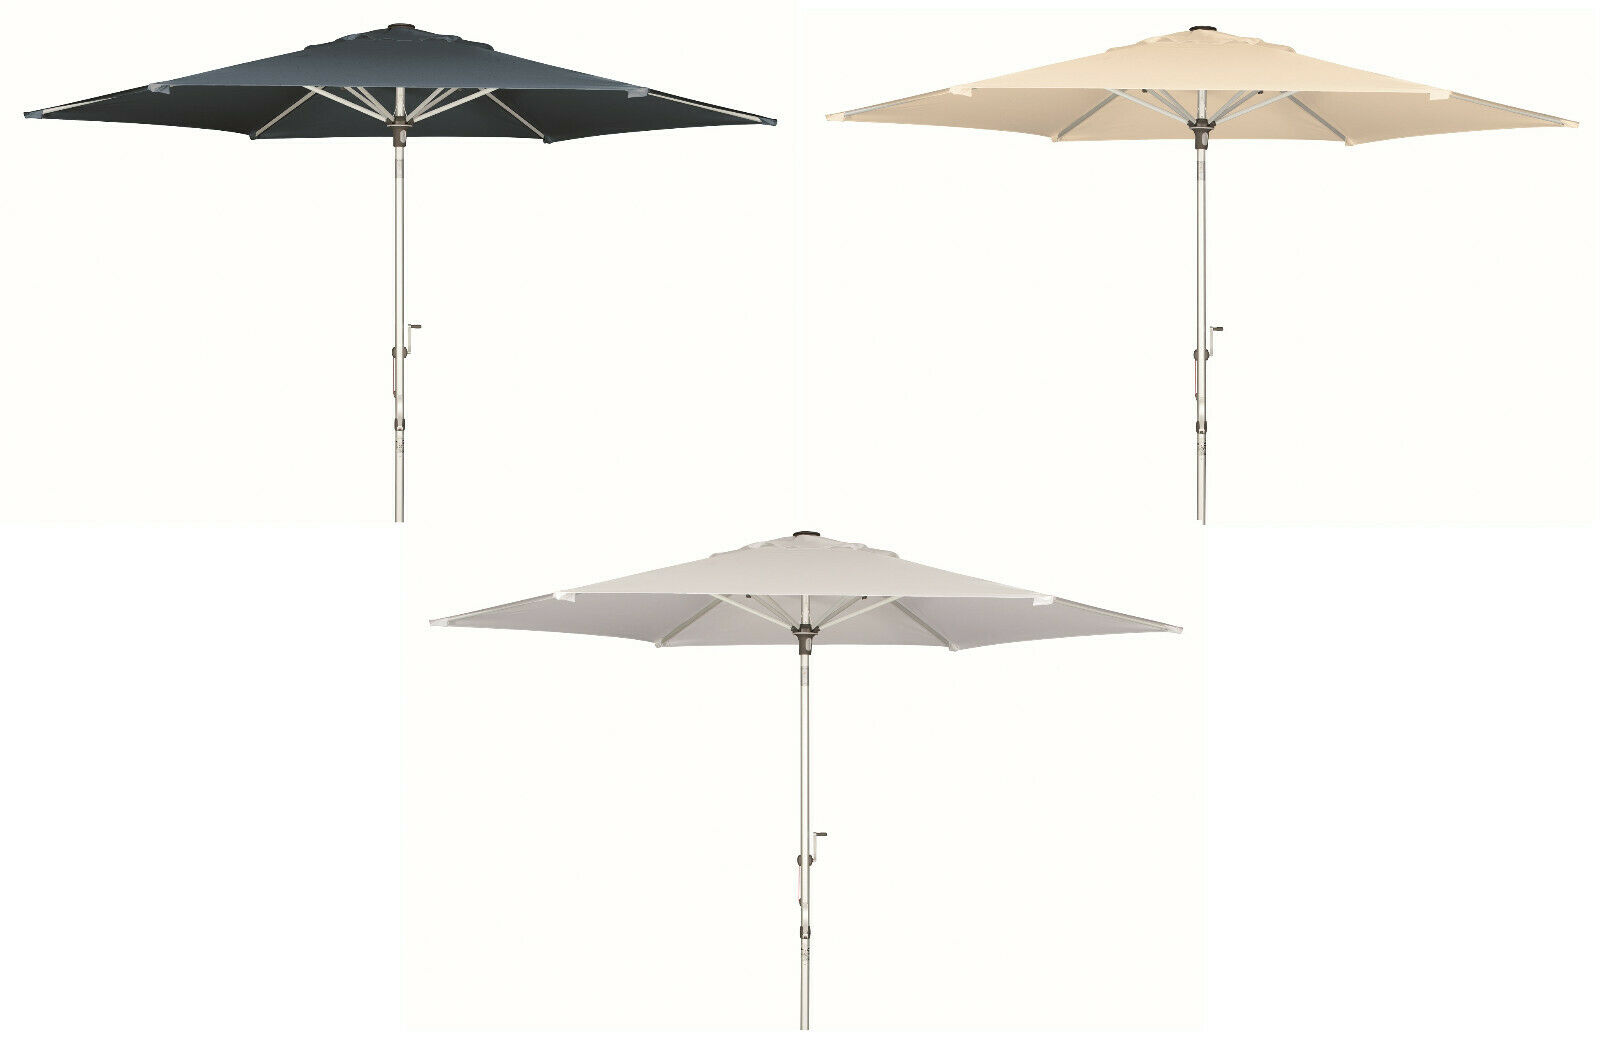 Doppler sombrilla de aluminio Pro 305 cm alrojoedor del jardín paraguas knickbar resistente a la intemperie paraguas